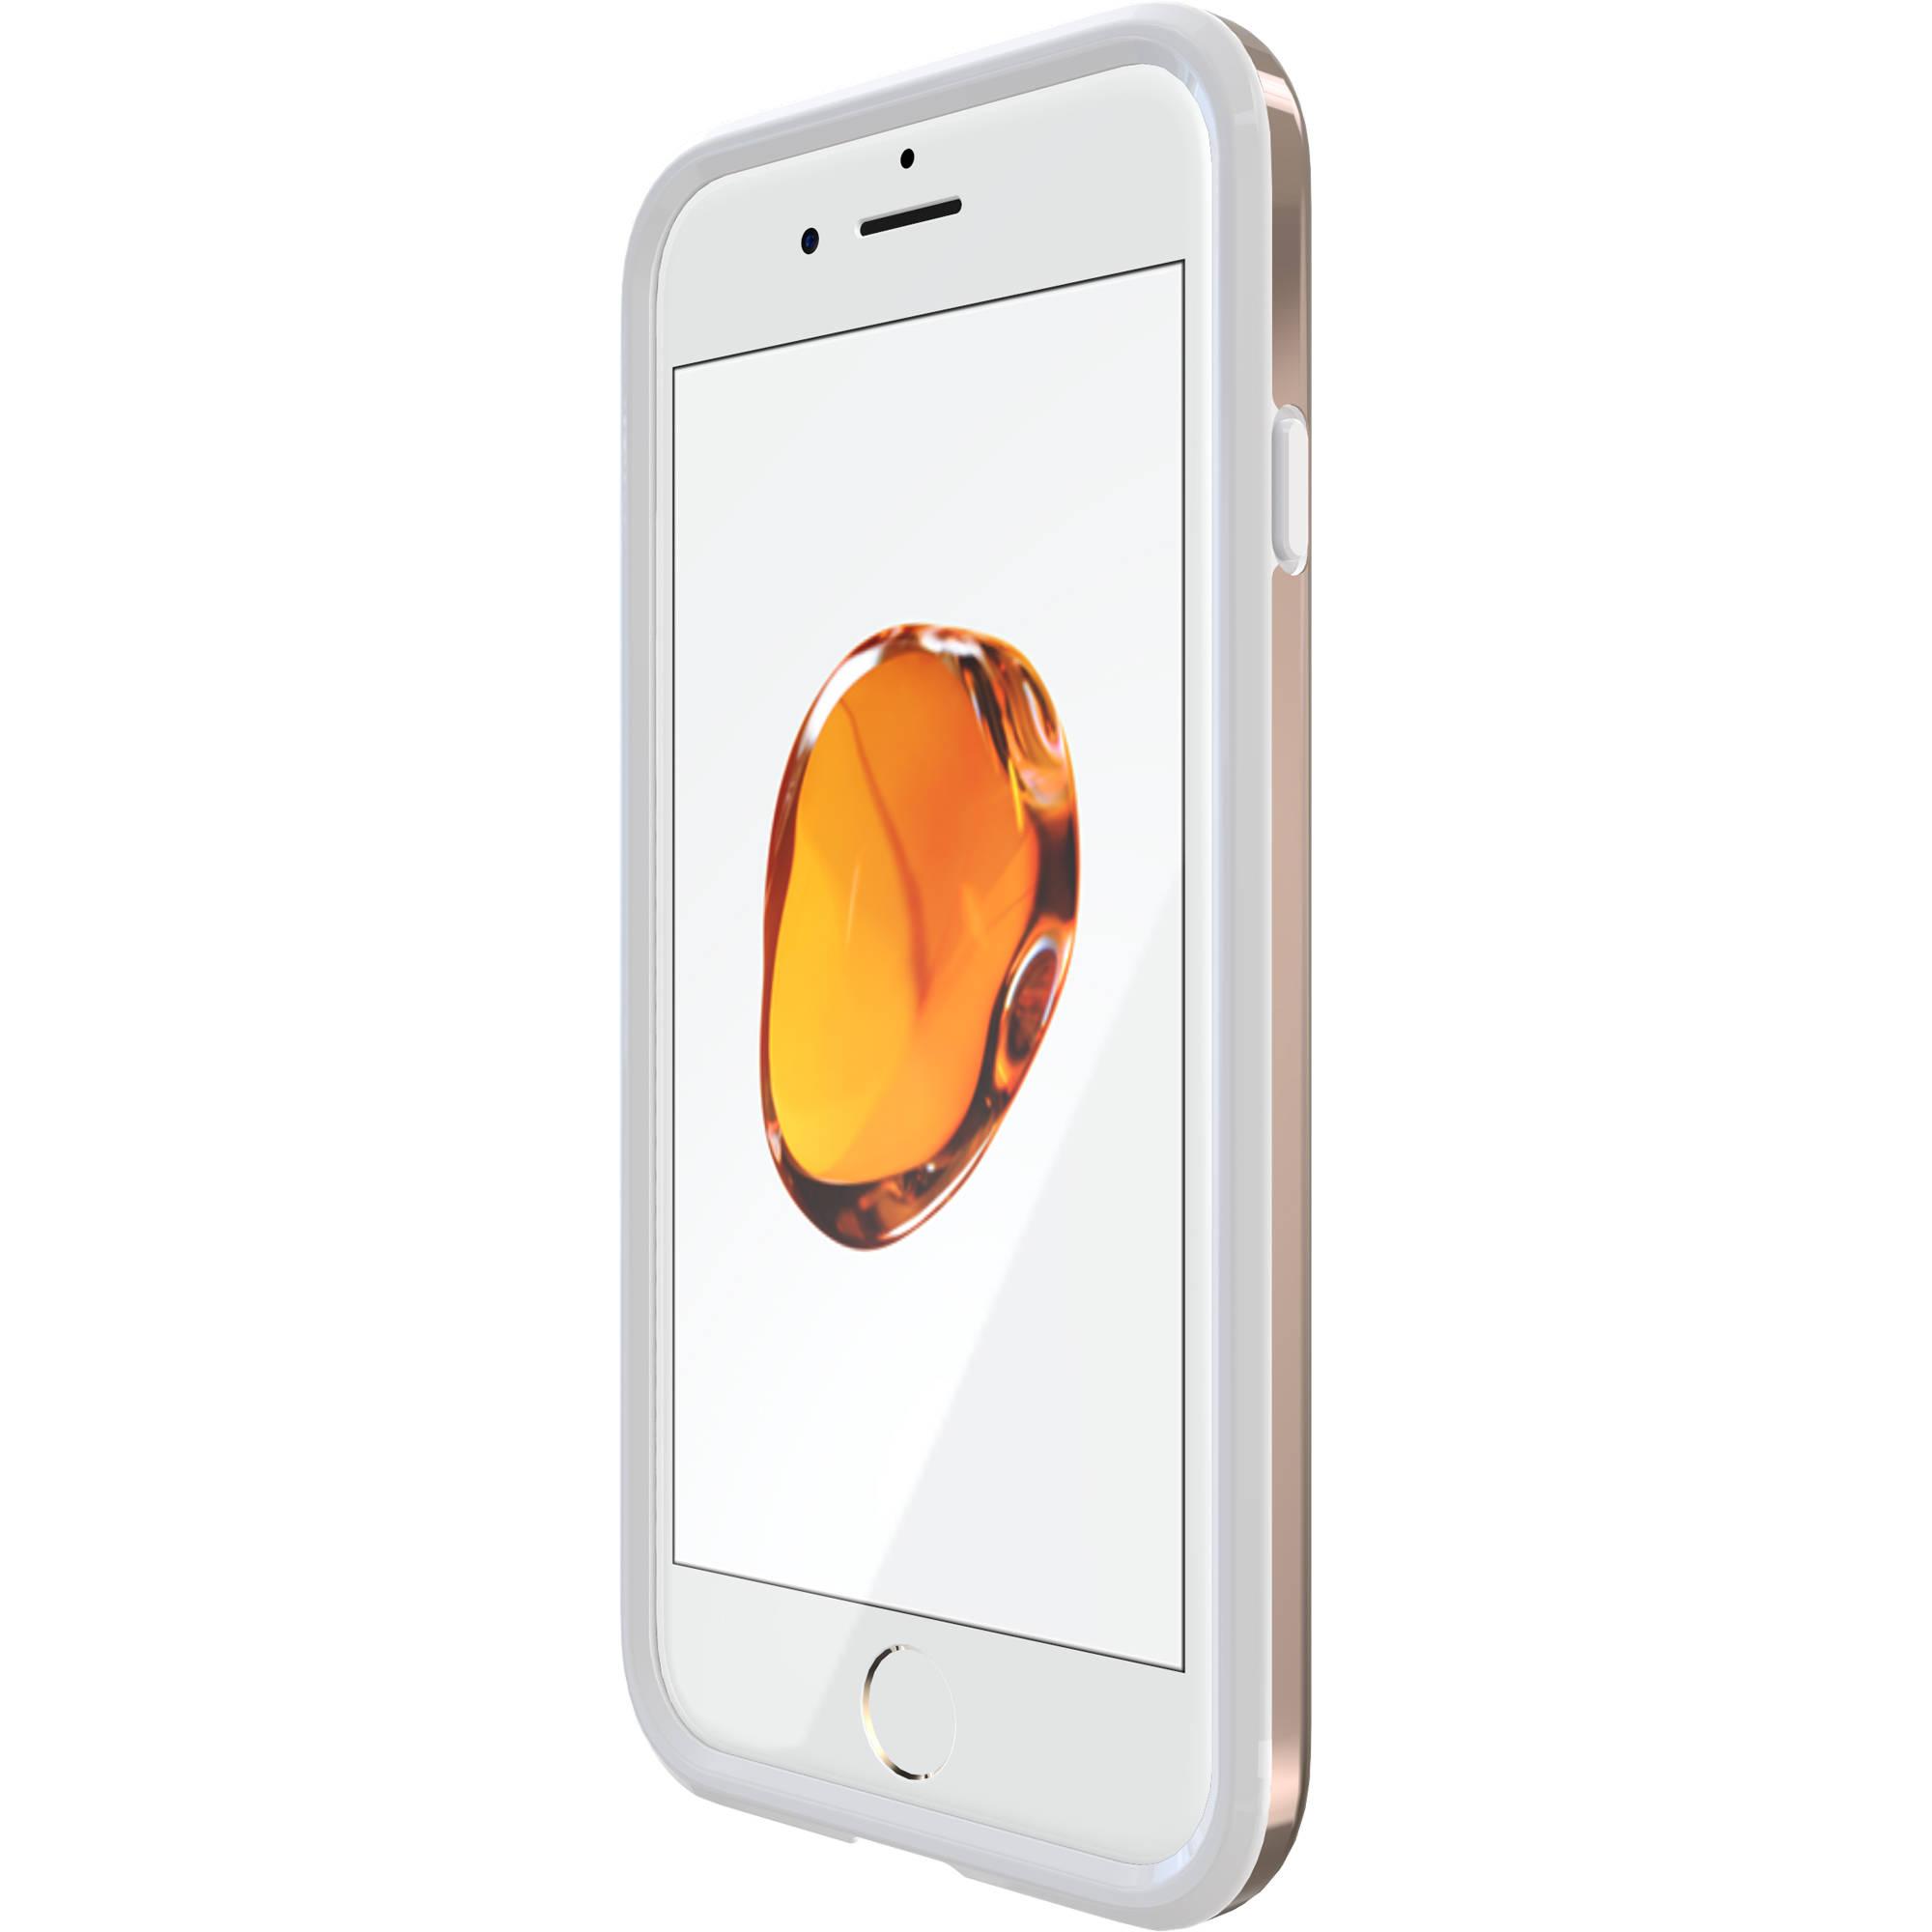 on sale d7764 7d537 Tech21 Evo Elite Case for iPhone 7 (Polished Rose Gold)